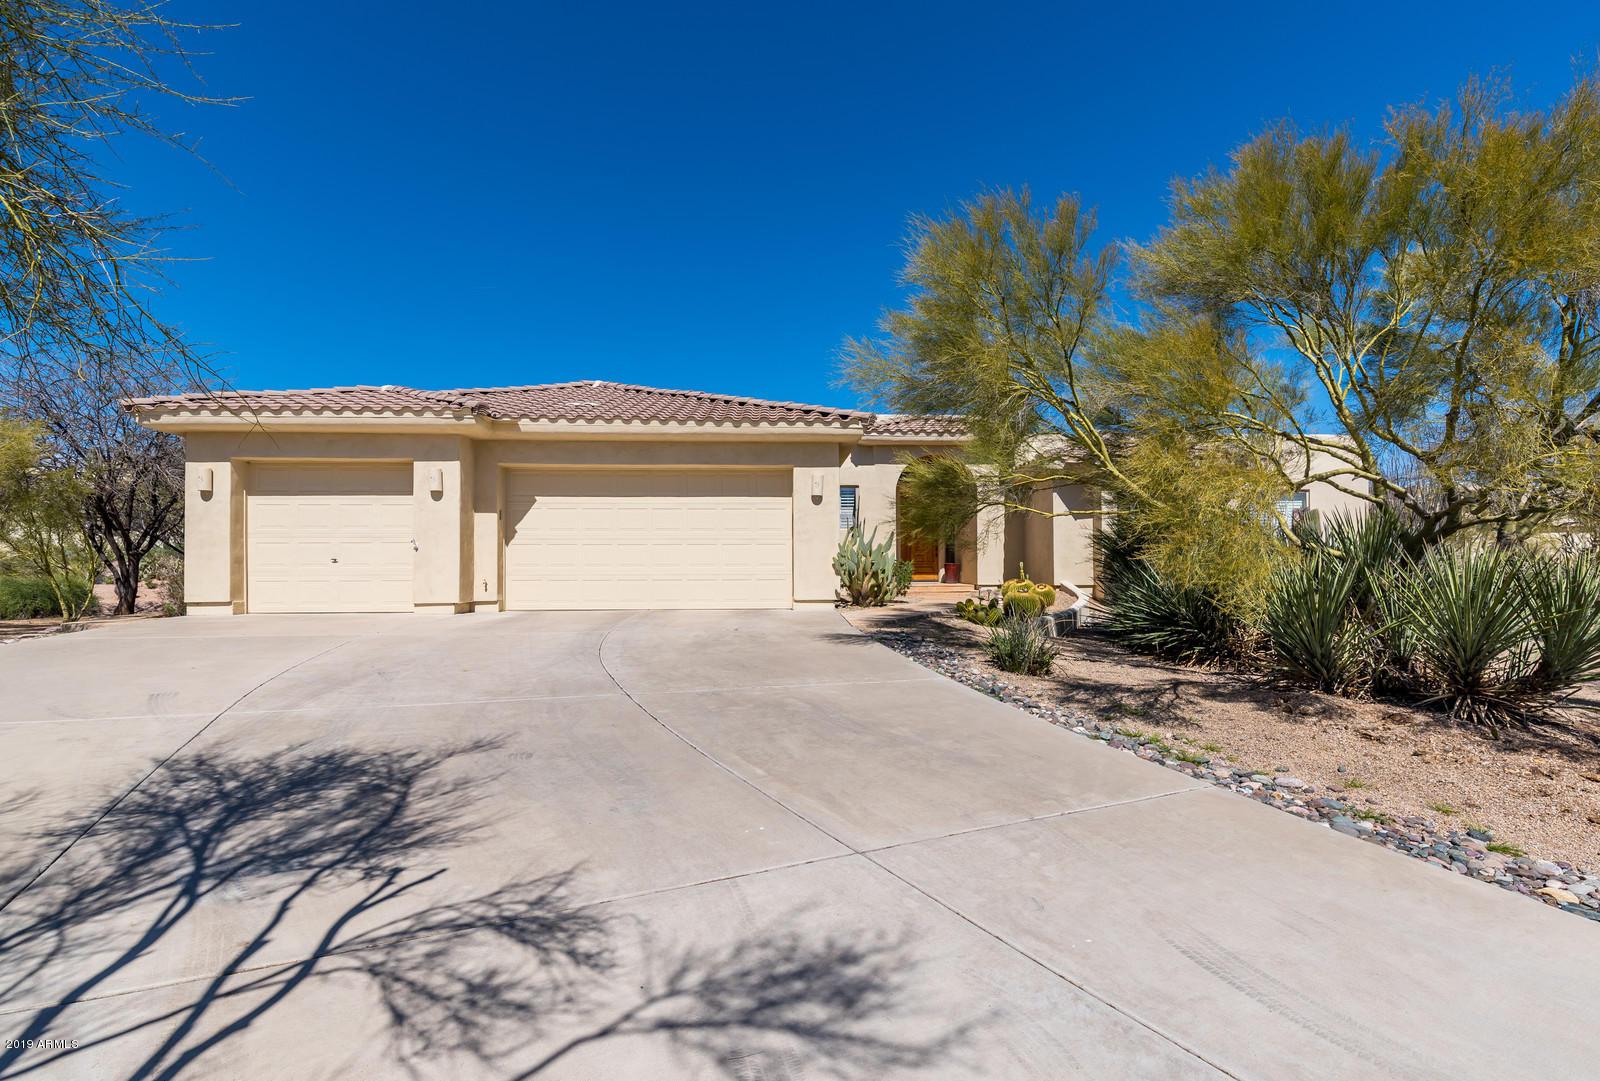 MLS 5900992 36832 N WILD FLOWER Road, Carefree, AZ 85377 Carefree AZ Four Bedroom